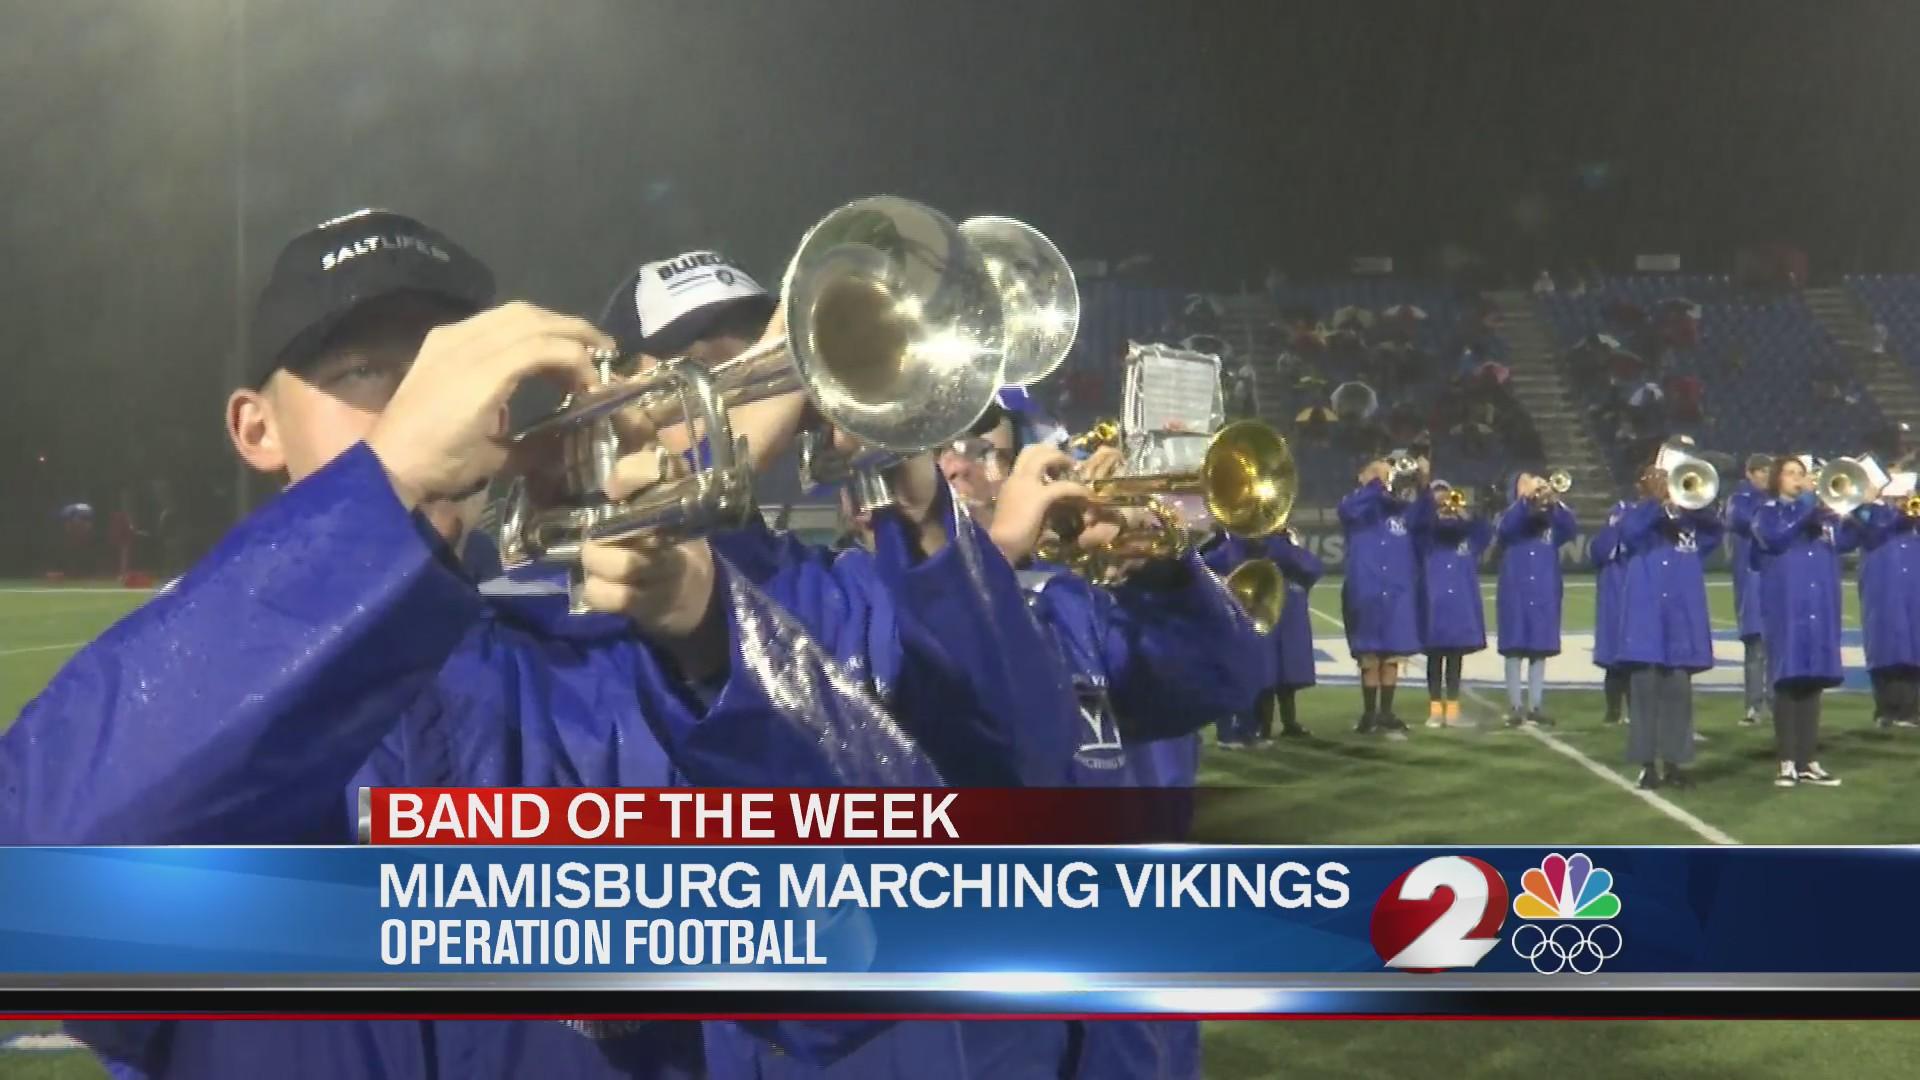 Miamisburg Marching Vikings